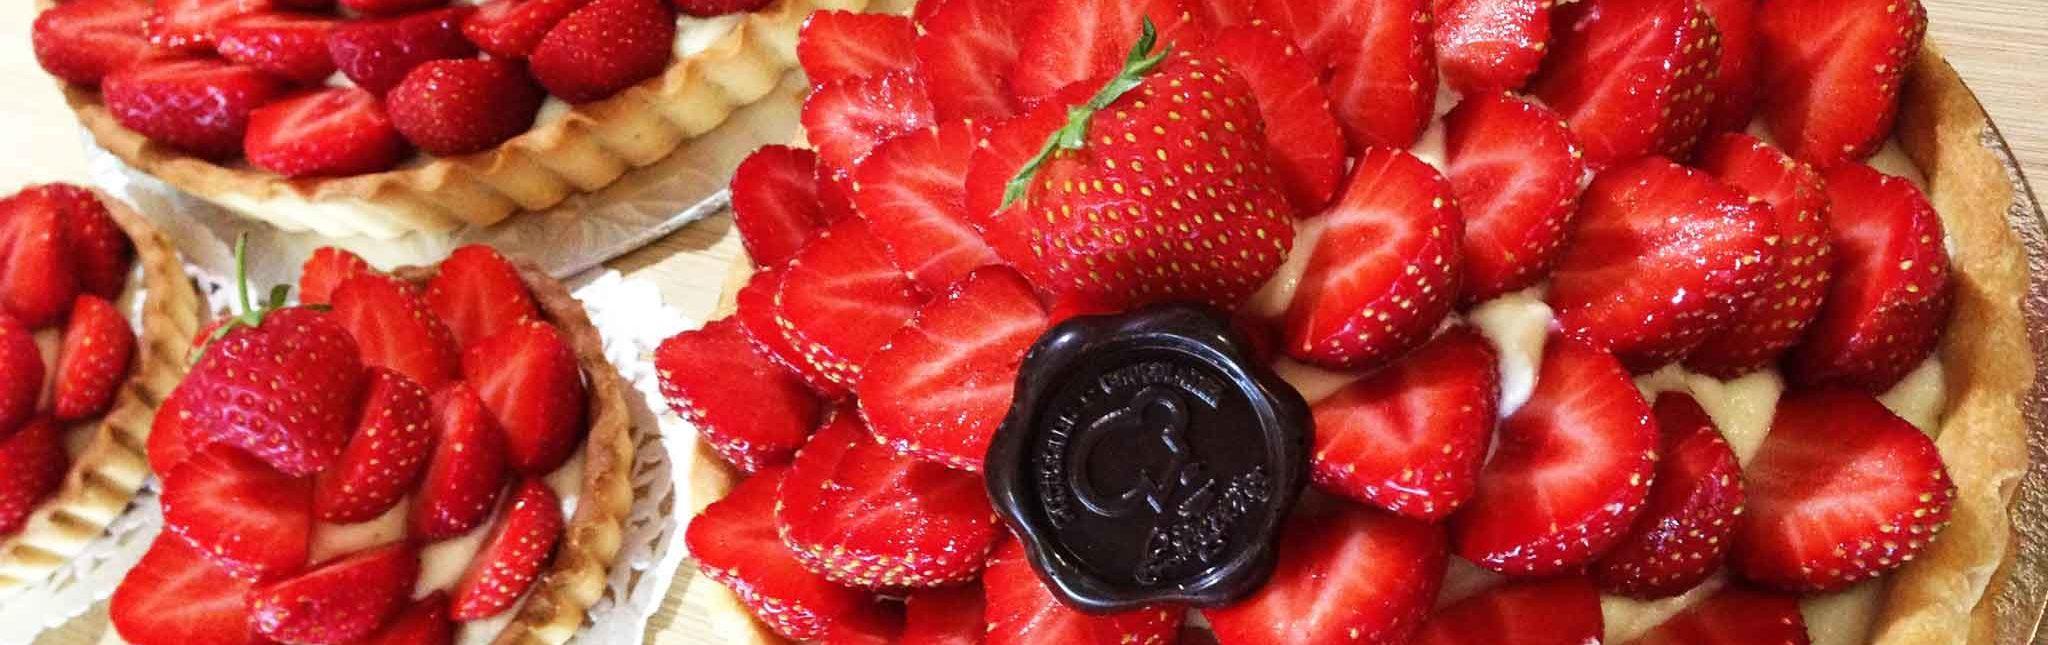 gateaux fraises la liegeoise sherbrooke